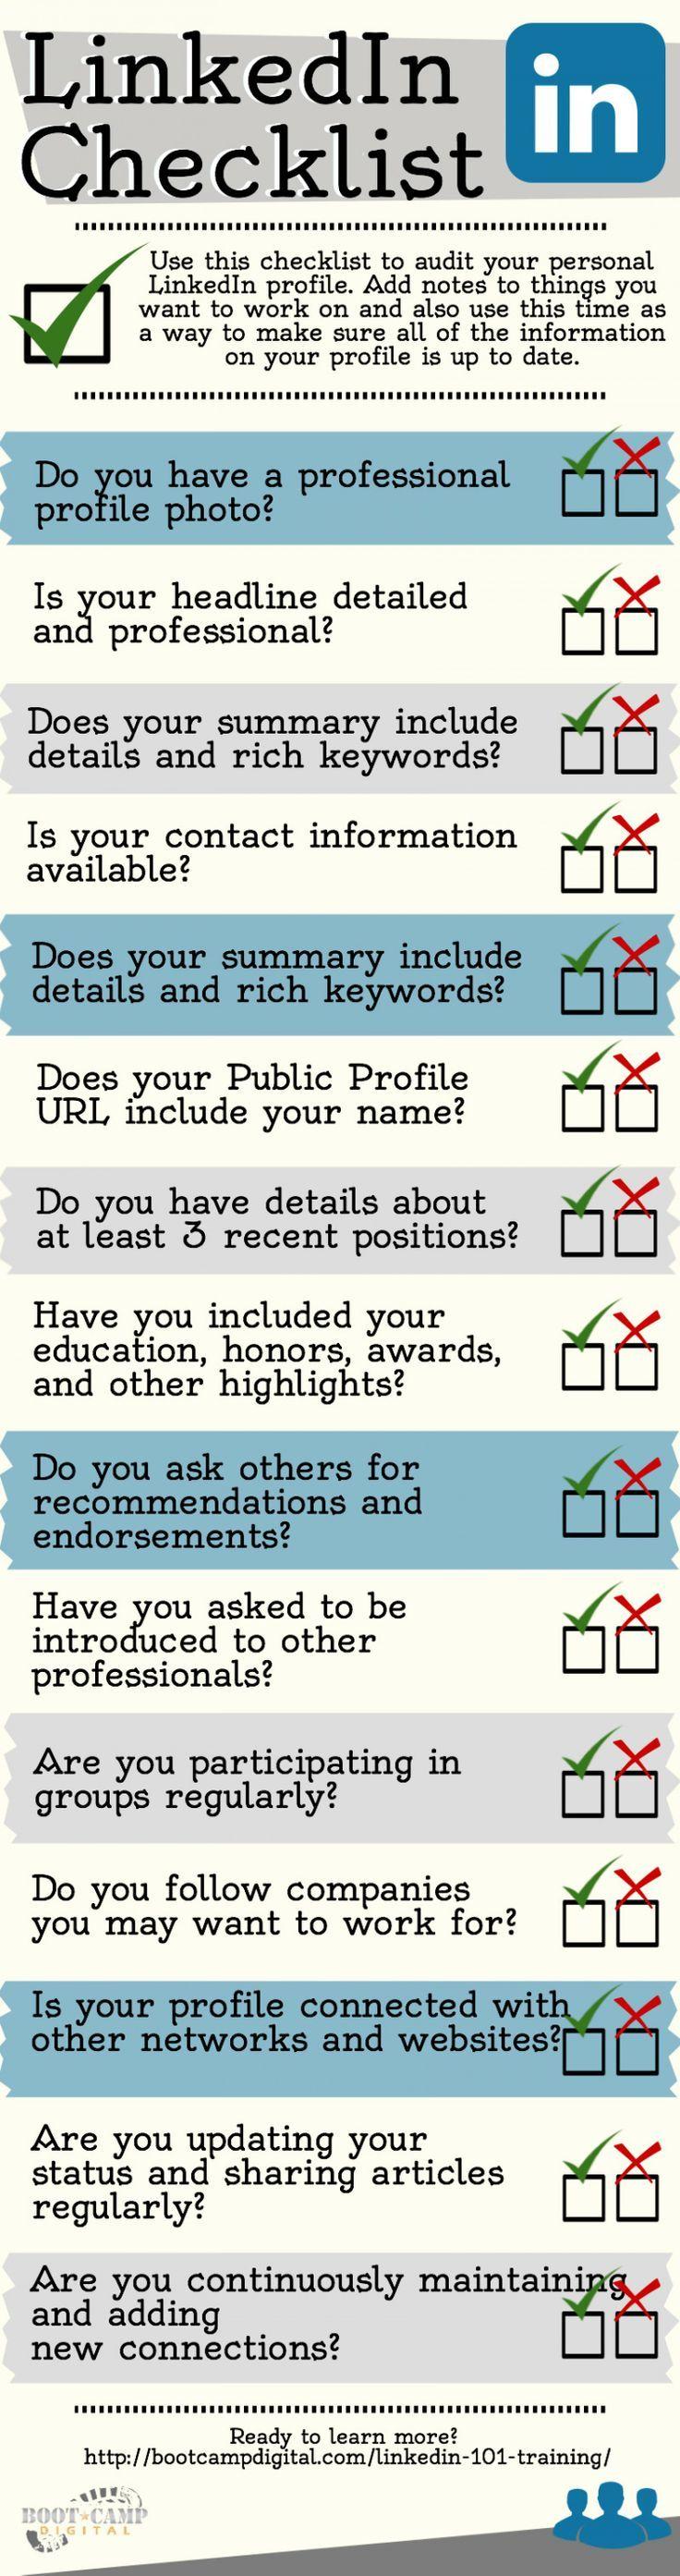 #LinkedIn Checklist [Infographic] - How to Create a Strong LinkedIn Profile #socialmedia #marketing